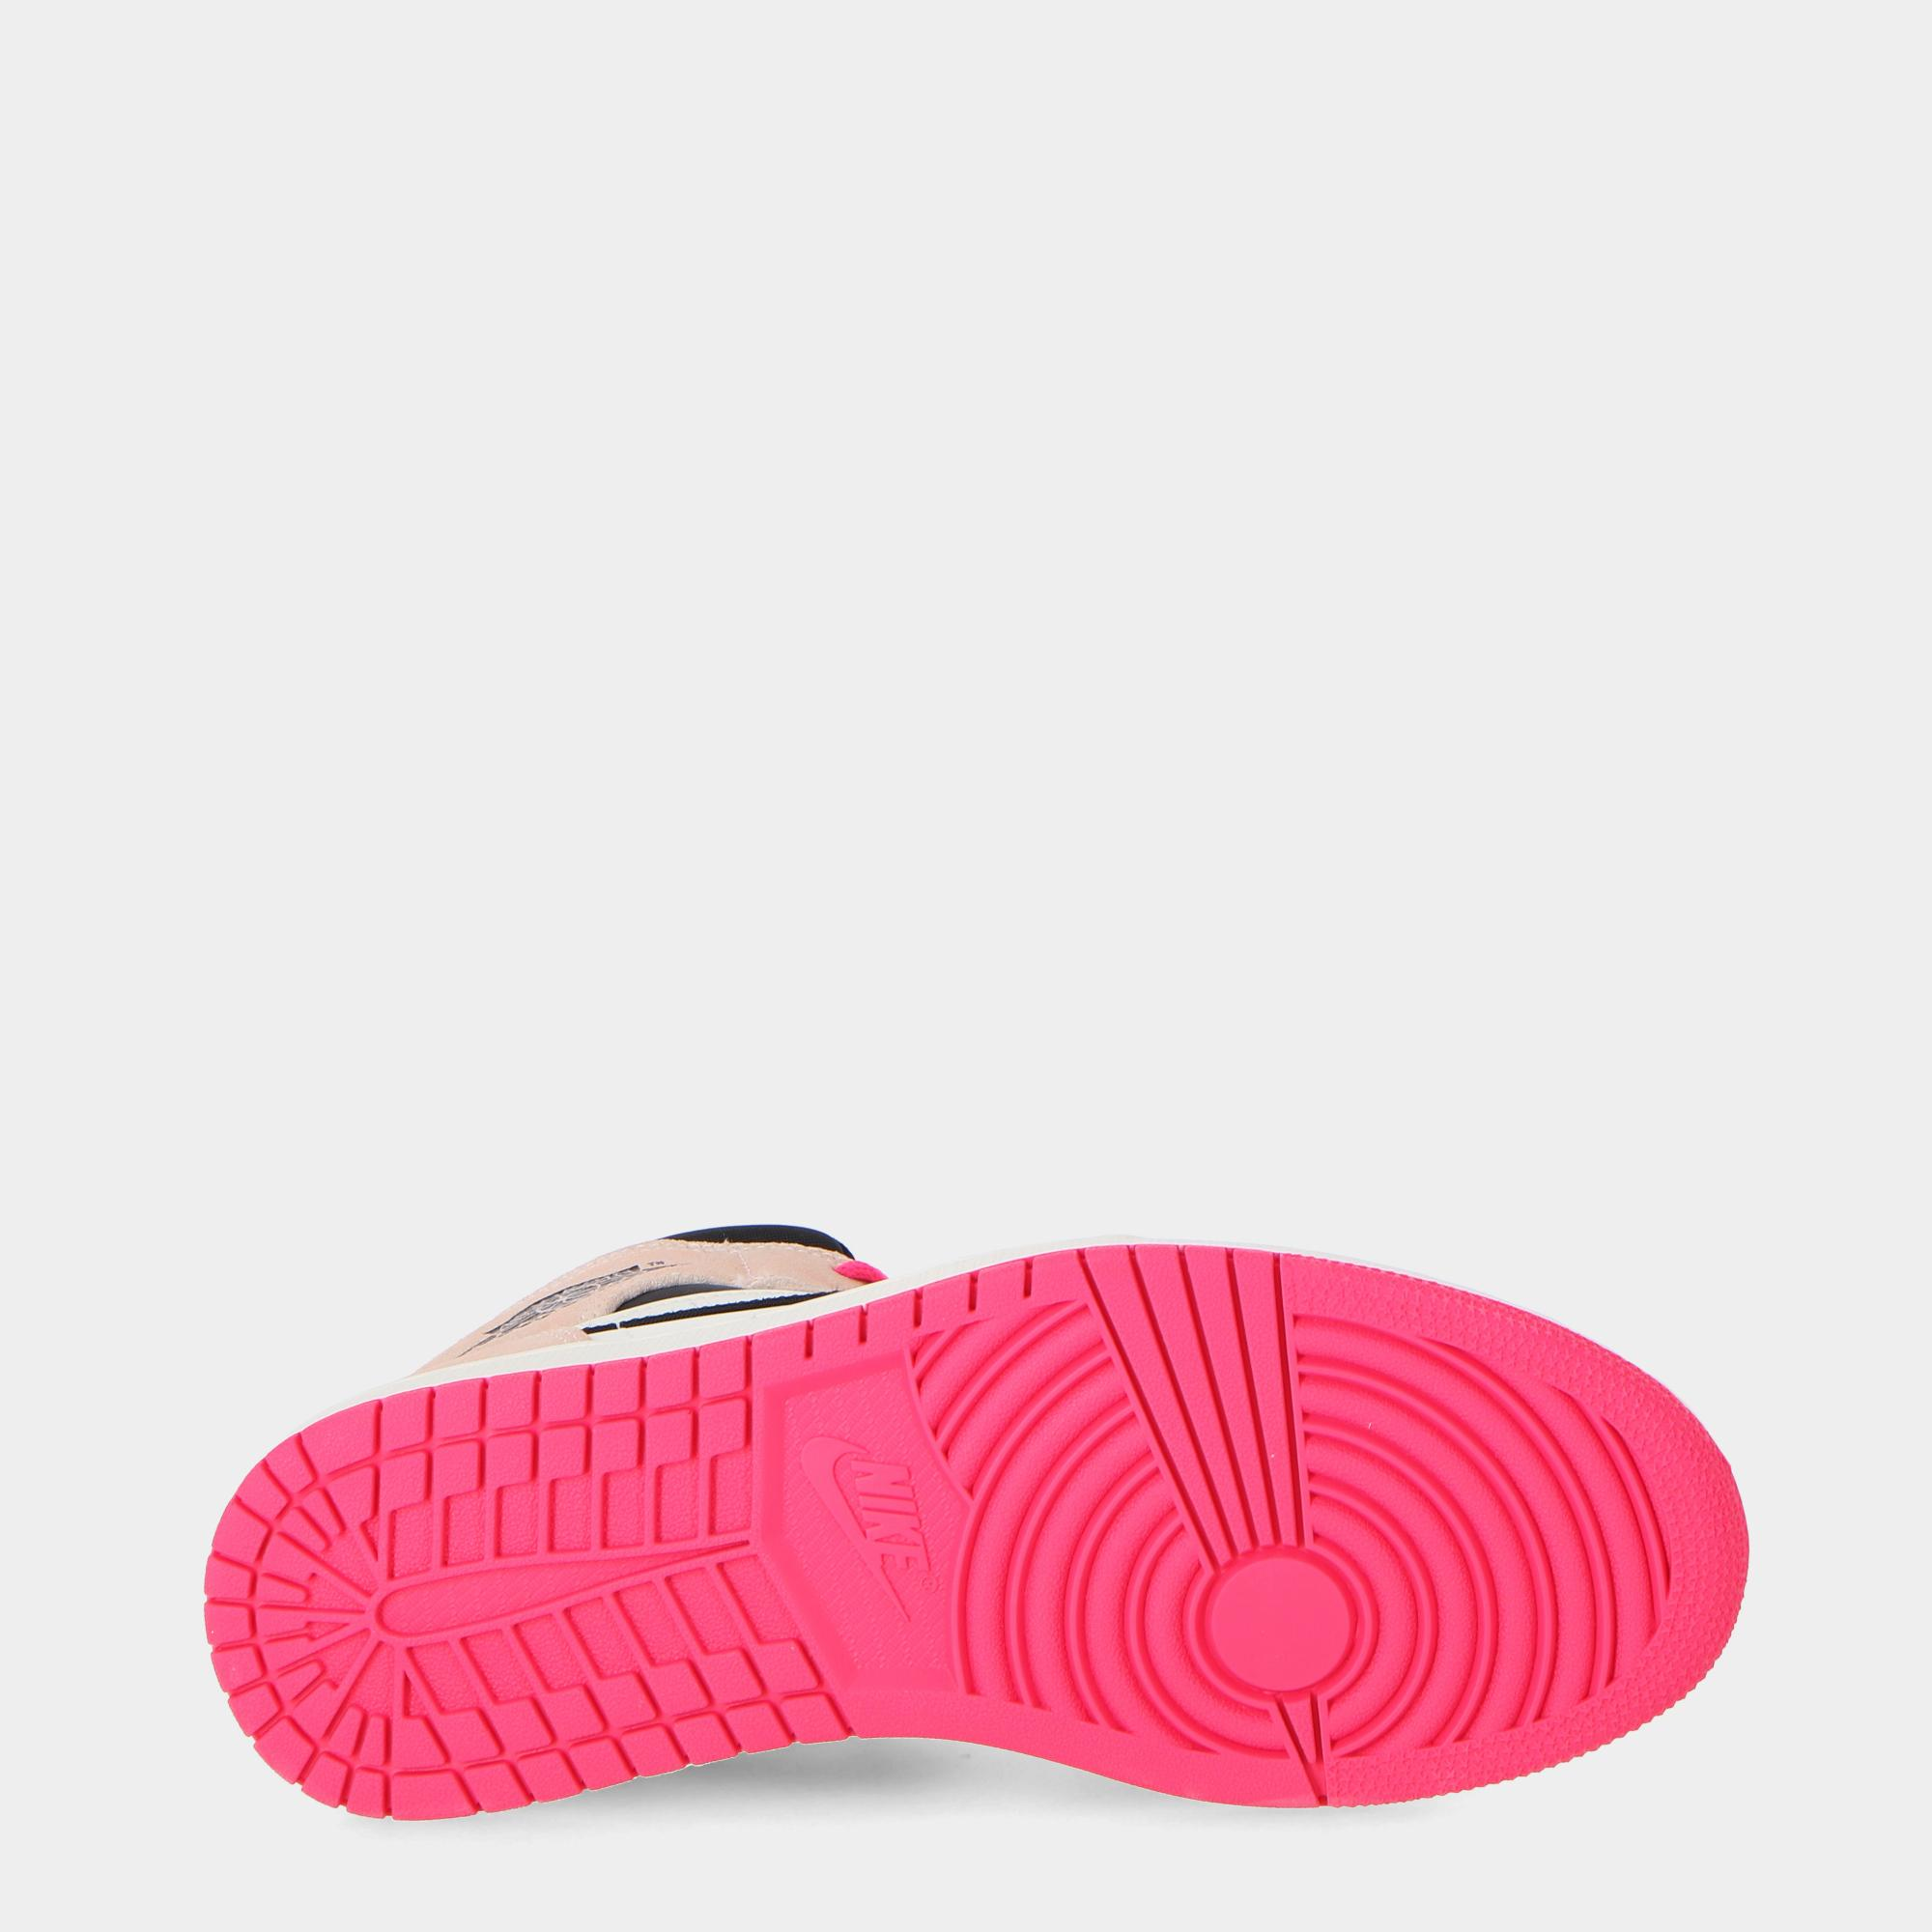 Air Jordan 1 Mid<br/> Crimson tint hyp pink blk sail